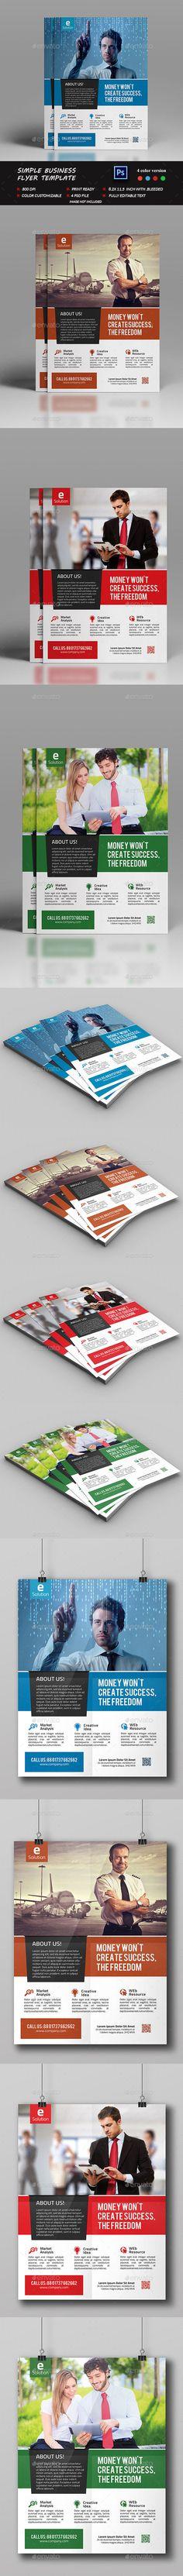 Simple Business Flyer Template PSD #design Download: http://graphicriver.net/item/simple-business-flyer/12870382?ref=ksioks